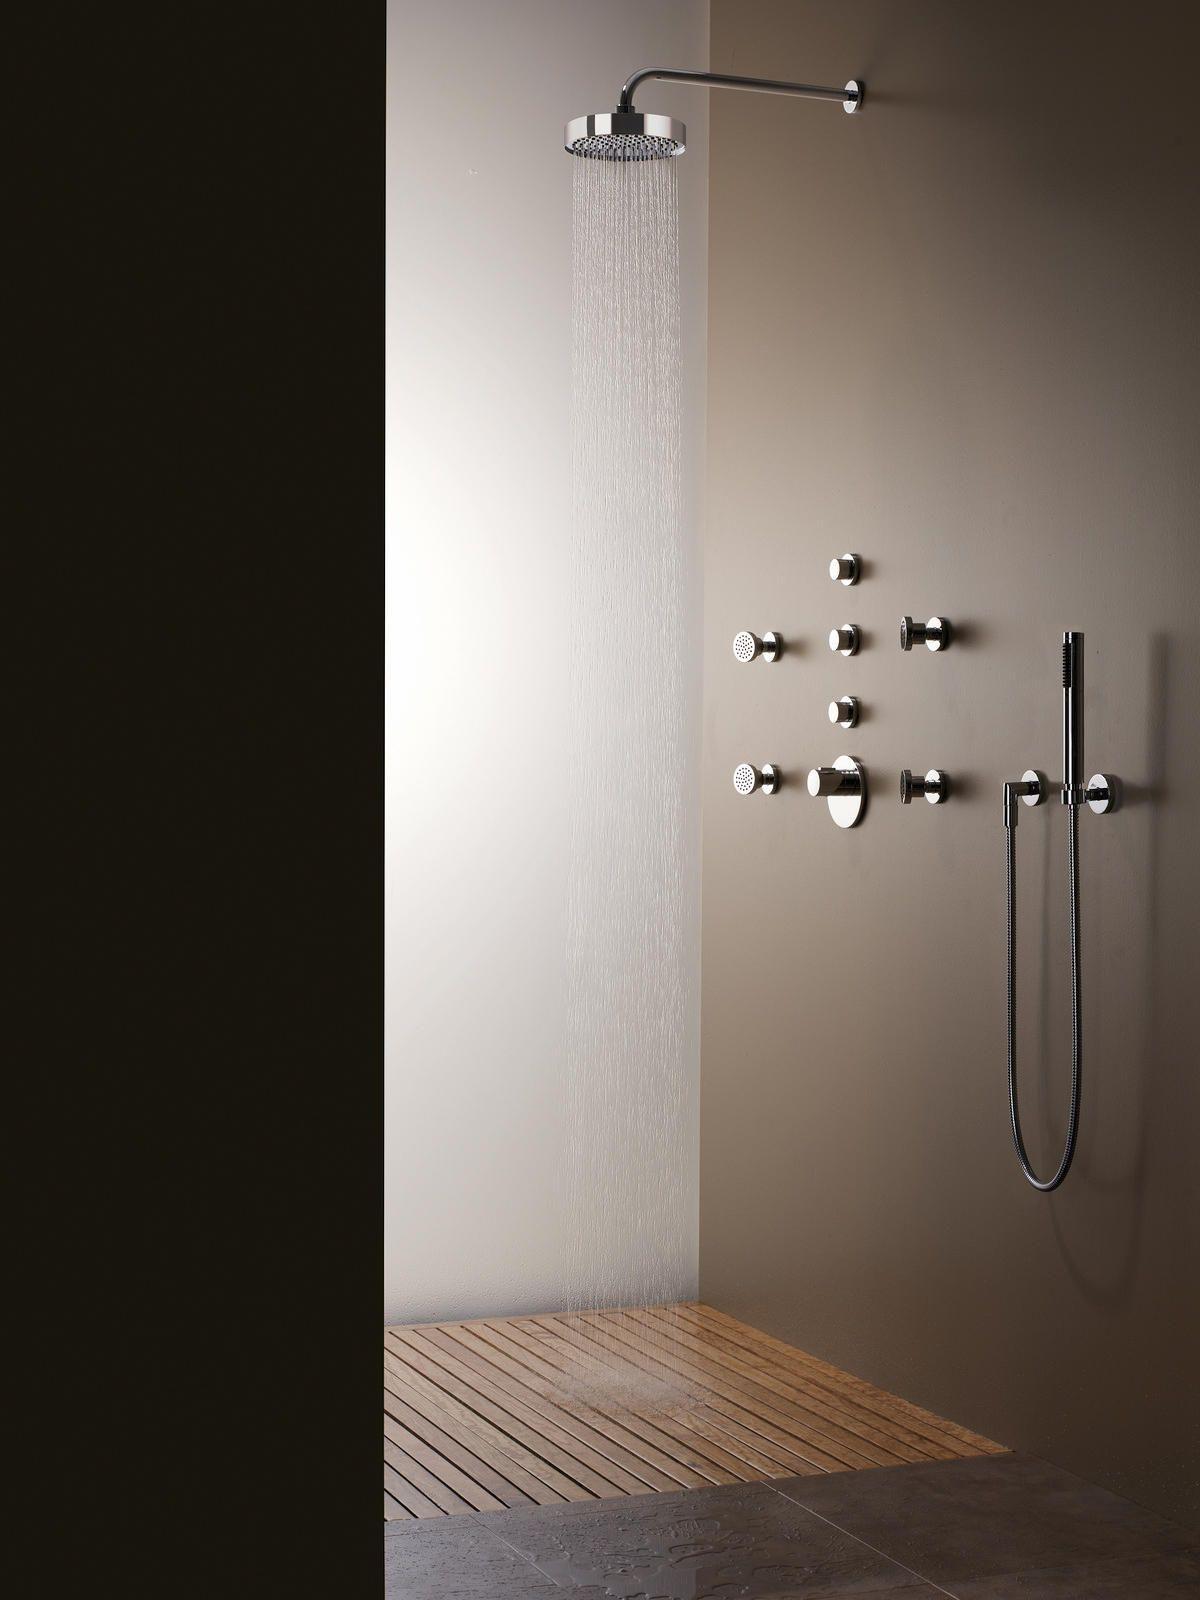 Meta 02 Hand Shower Set With Integrated Shower Holder By Sieger Design For Dornbracht Archi Dornbracht Architecture Bathroom Design Shower Plumbing Fixtures [ jpg ]